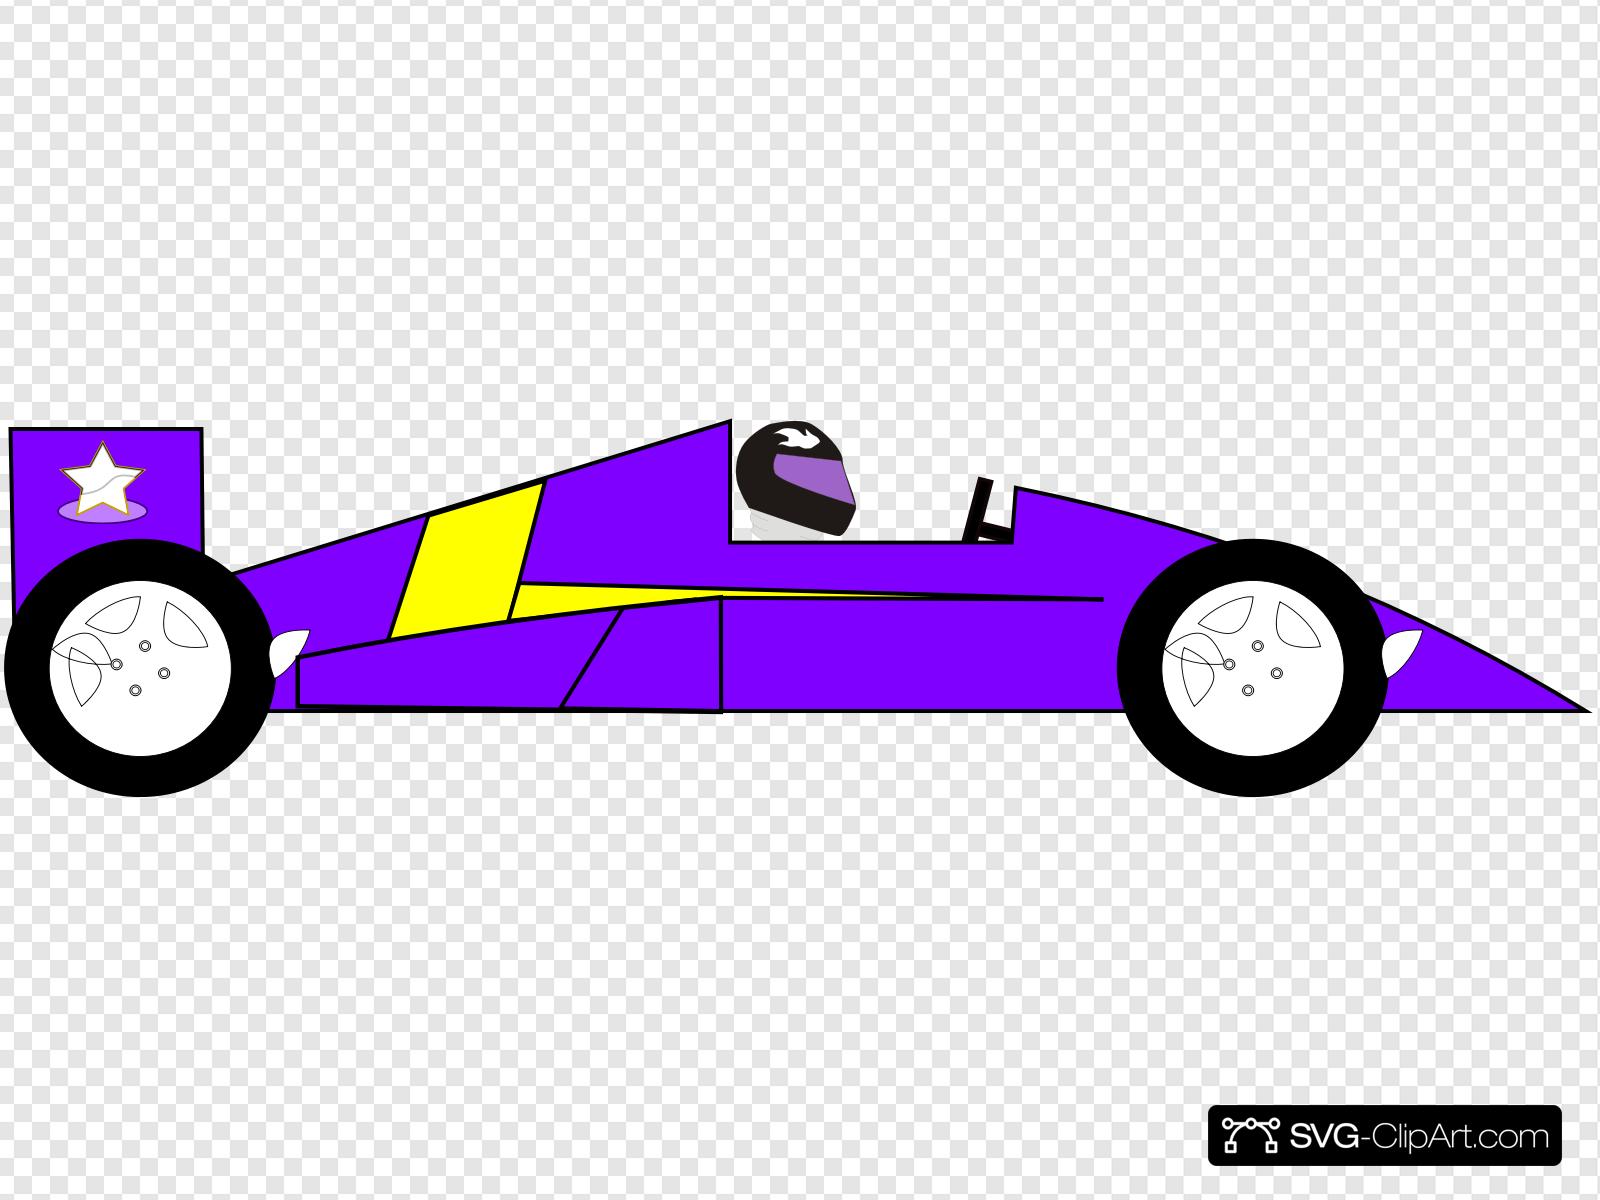 Purple Racecar Clip art, Icon and SVG.